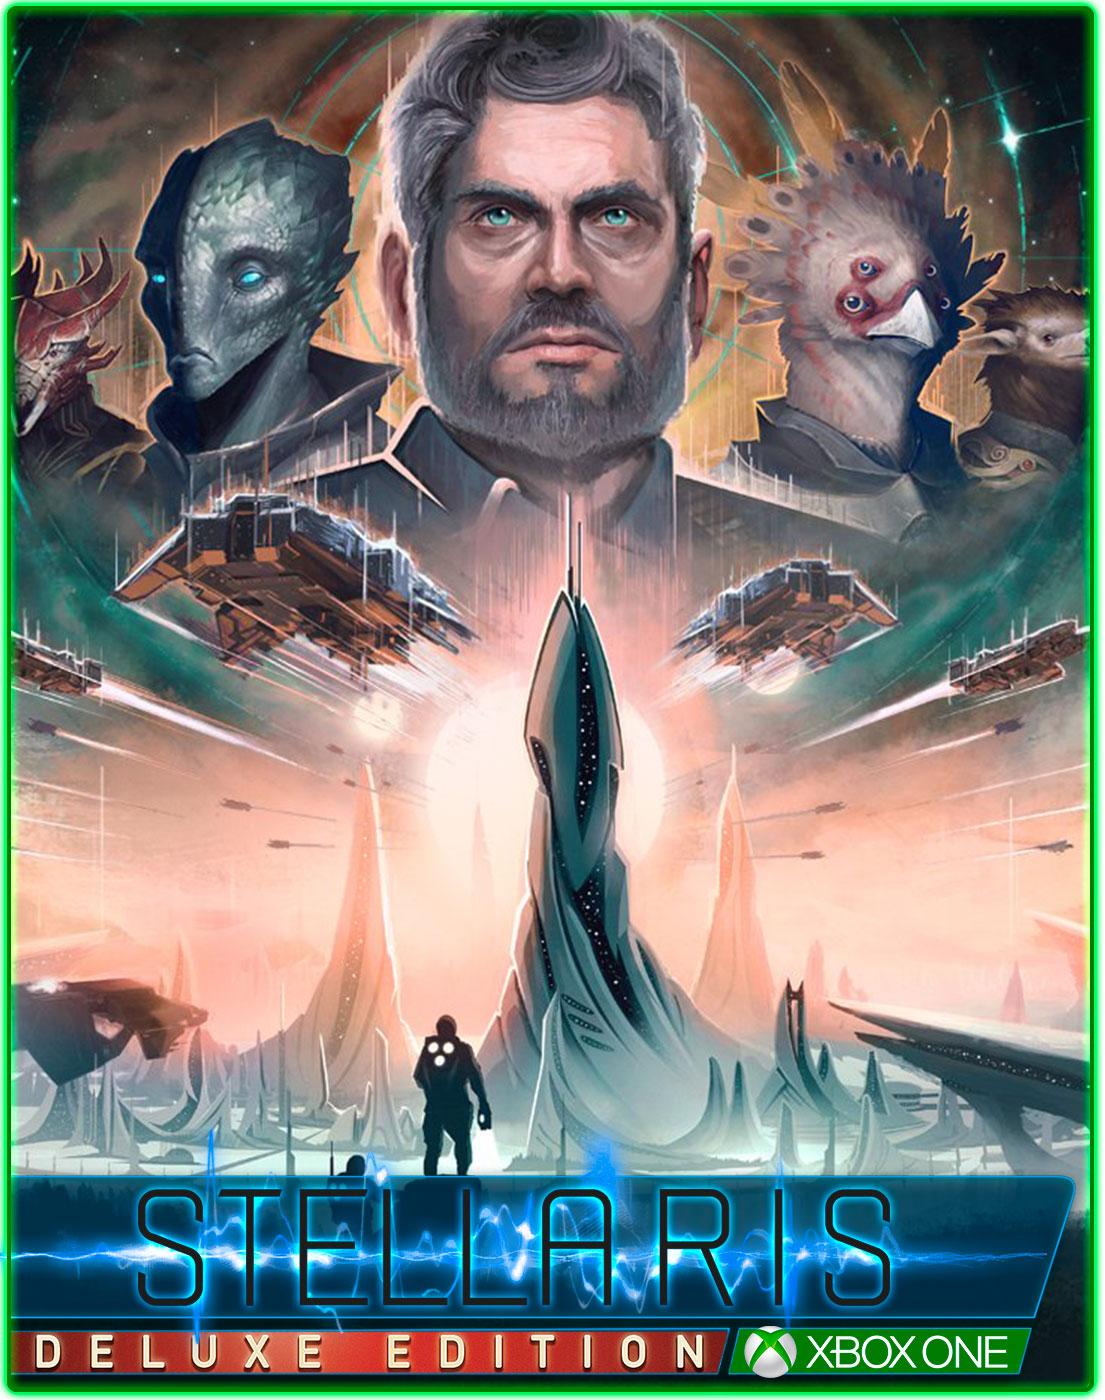 Stellaris Console Edition Deluxe Edition(XBOX ONE) 2019